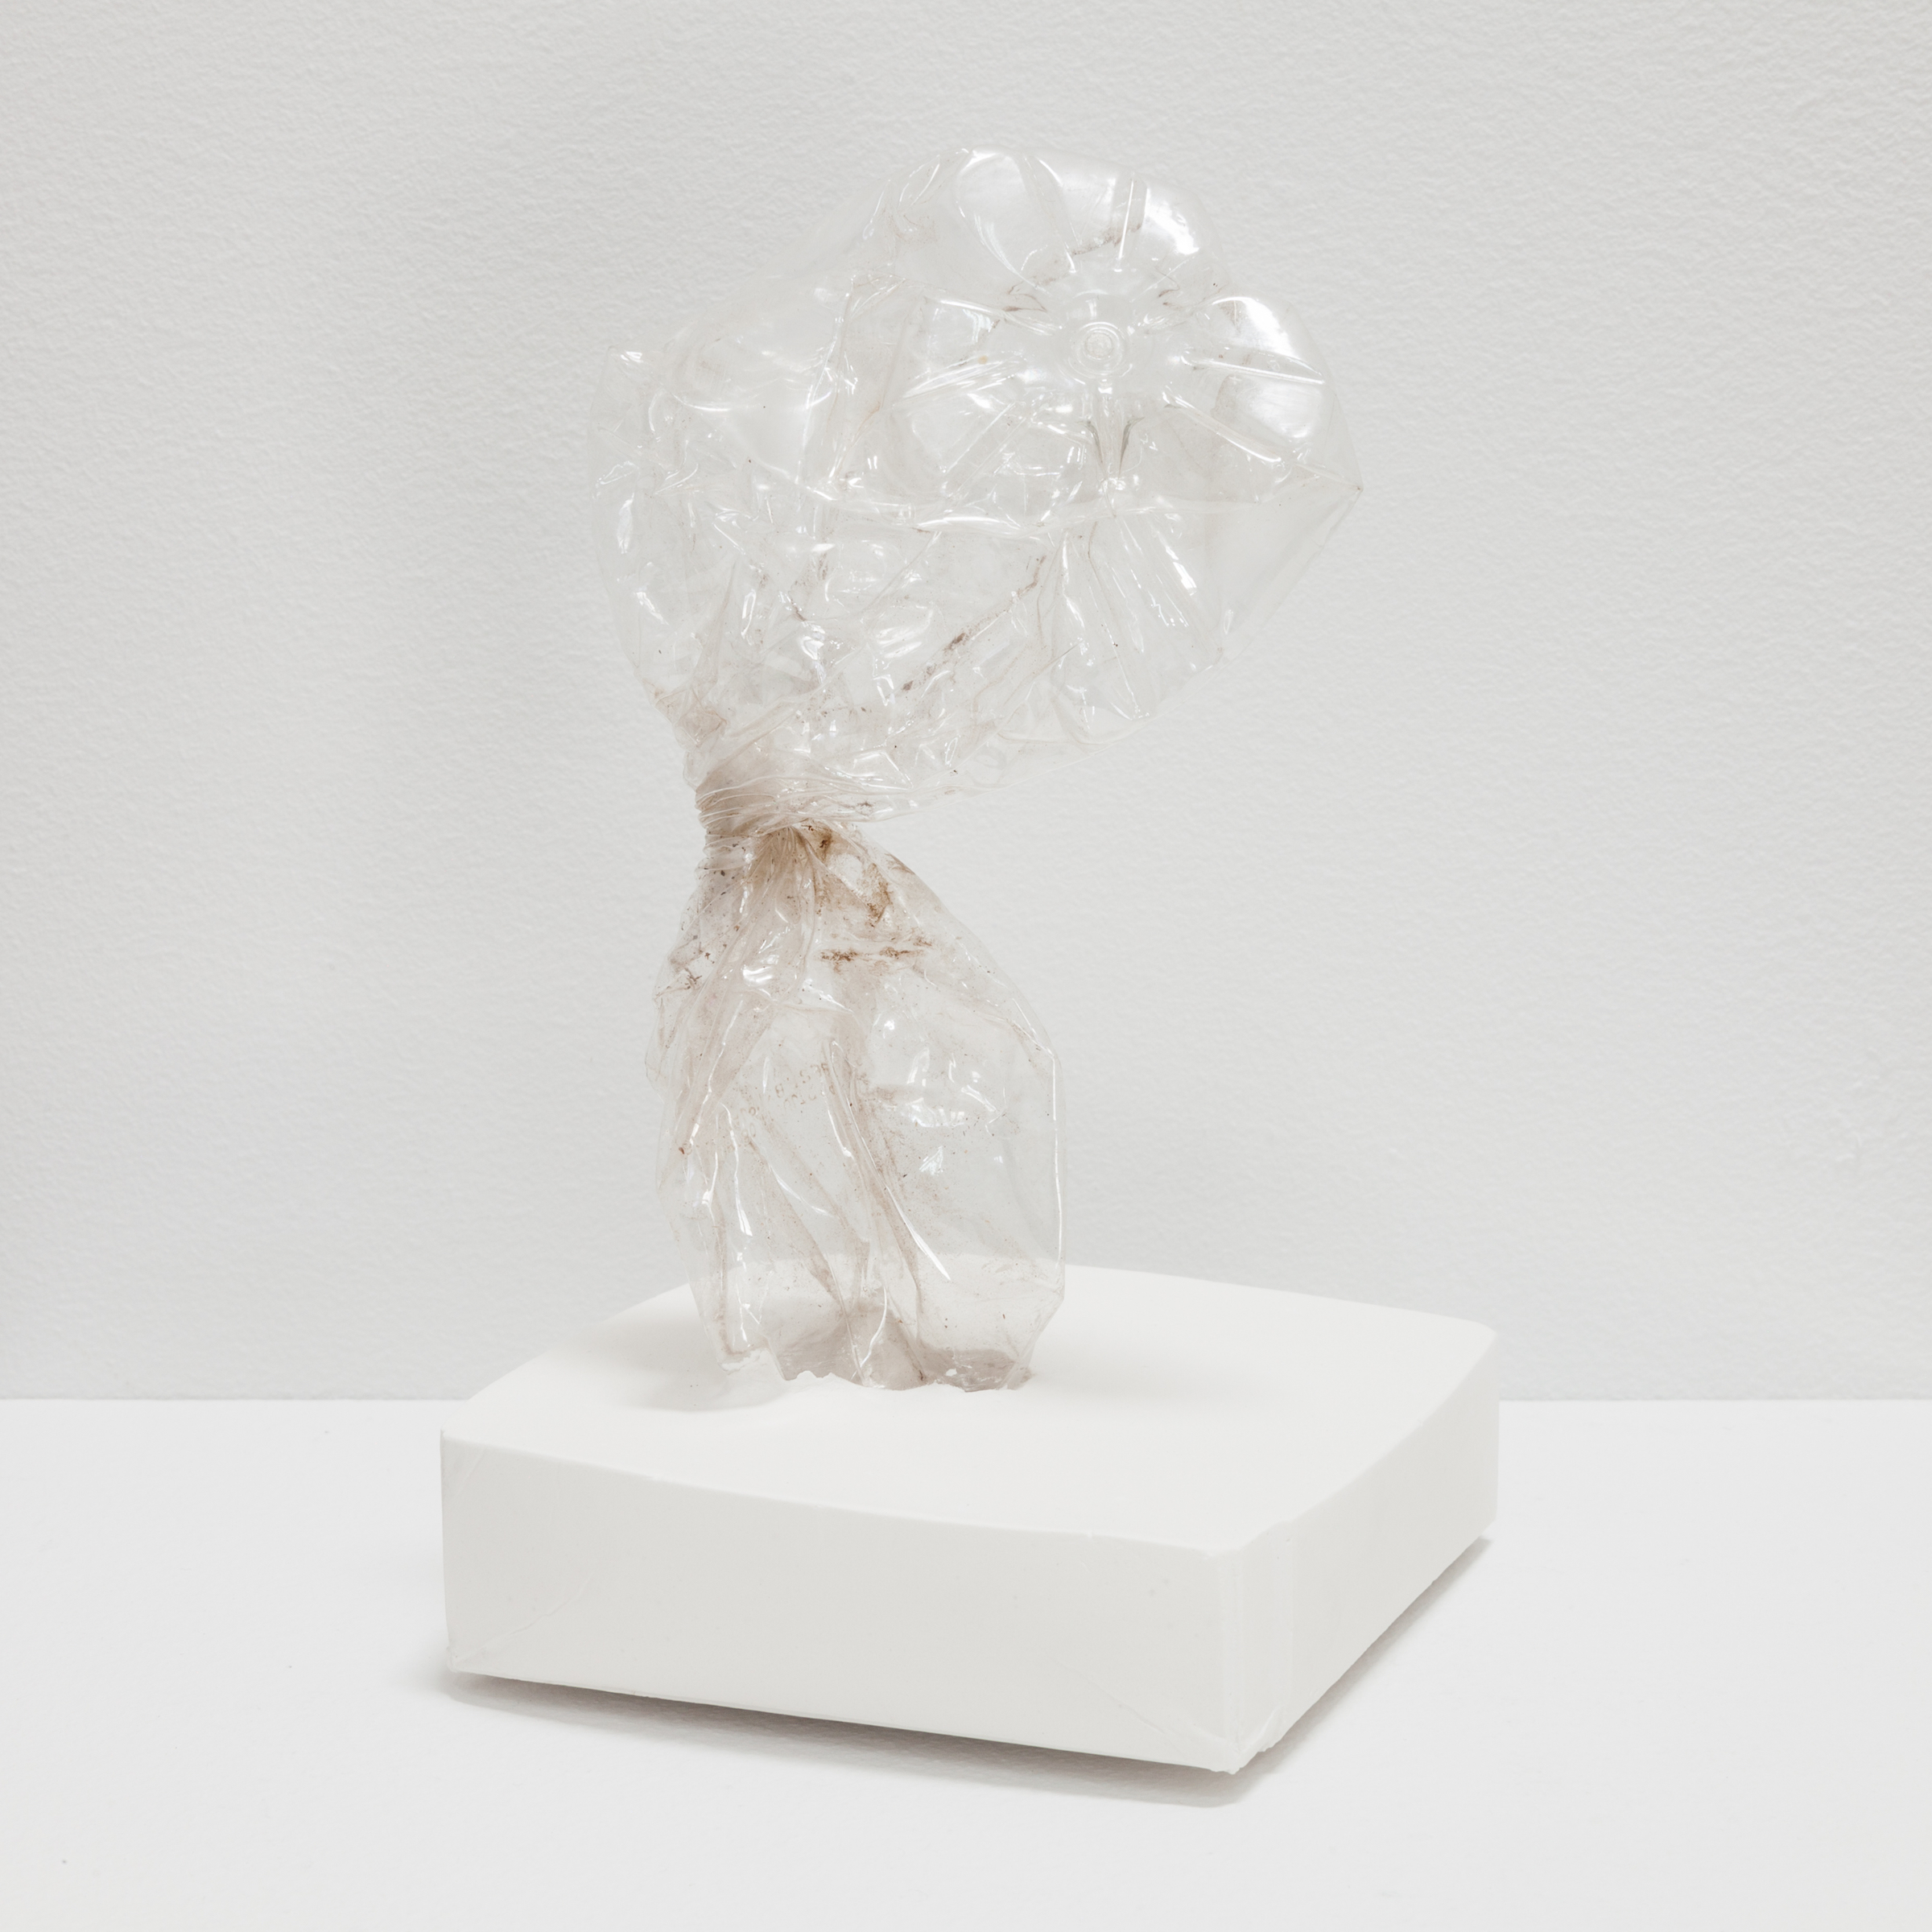 Deborah Hede,  Plastic Bottle, twisted , 2013, plastic water bottle, plaster, 5 × 4 × 4 in